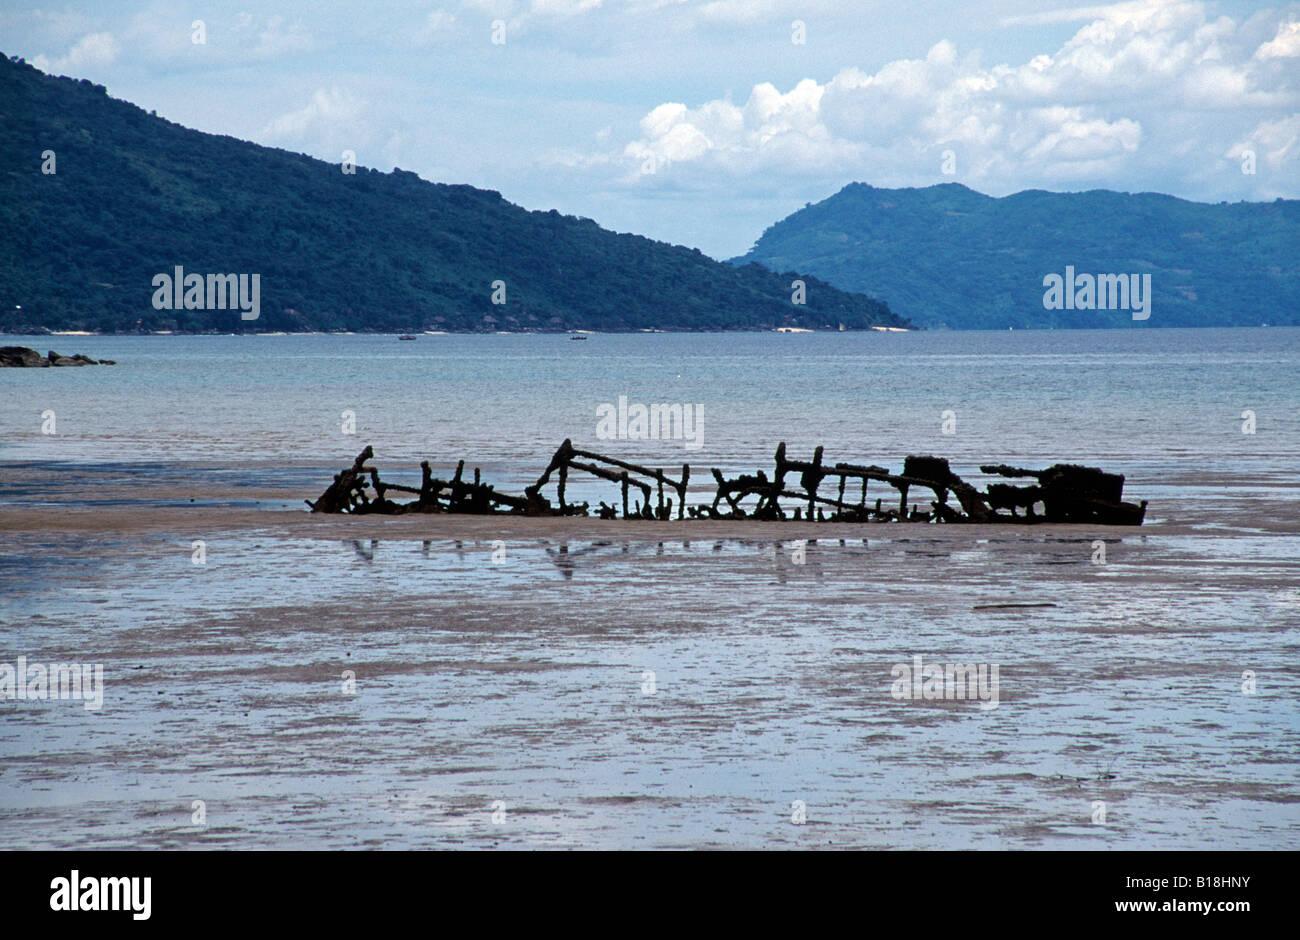 Maradoka shipwreck near Hell Ville, Nosy Be Madagascar - Stock Image